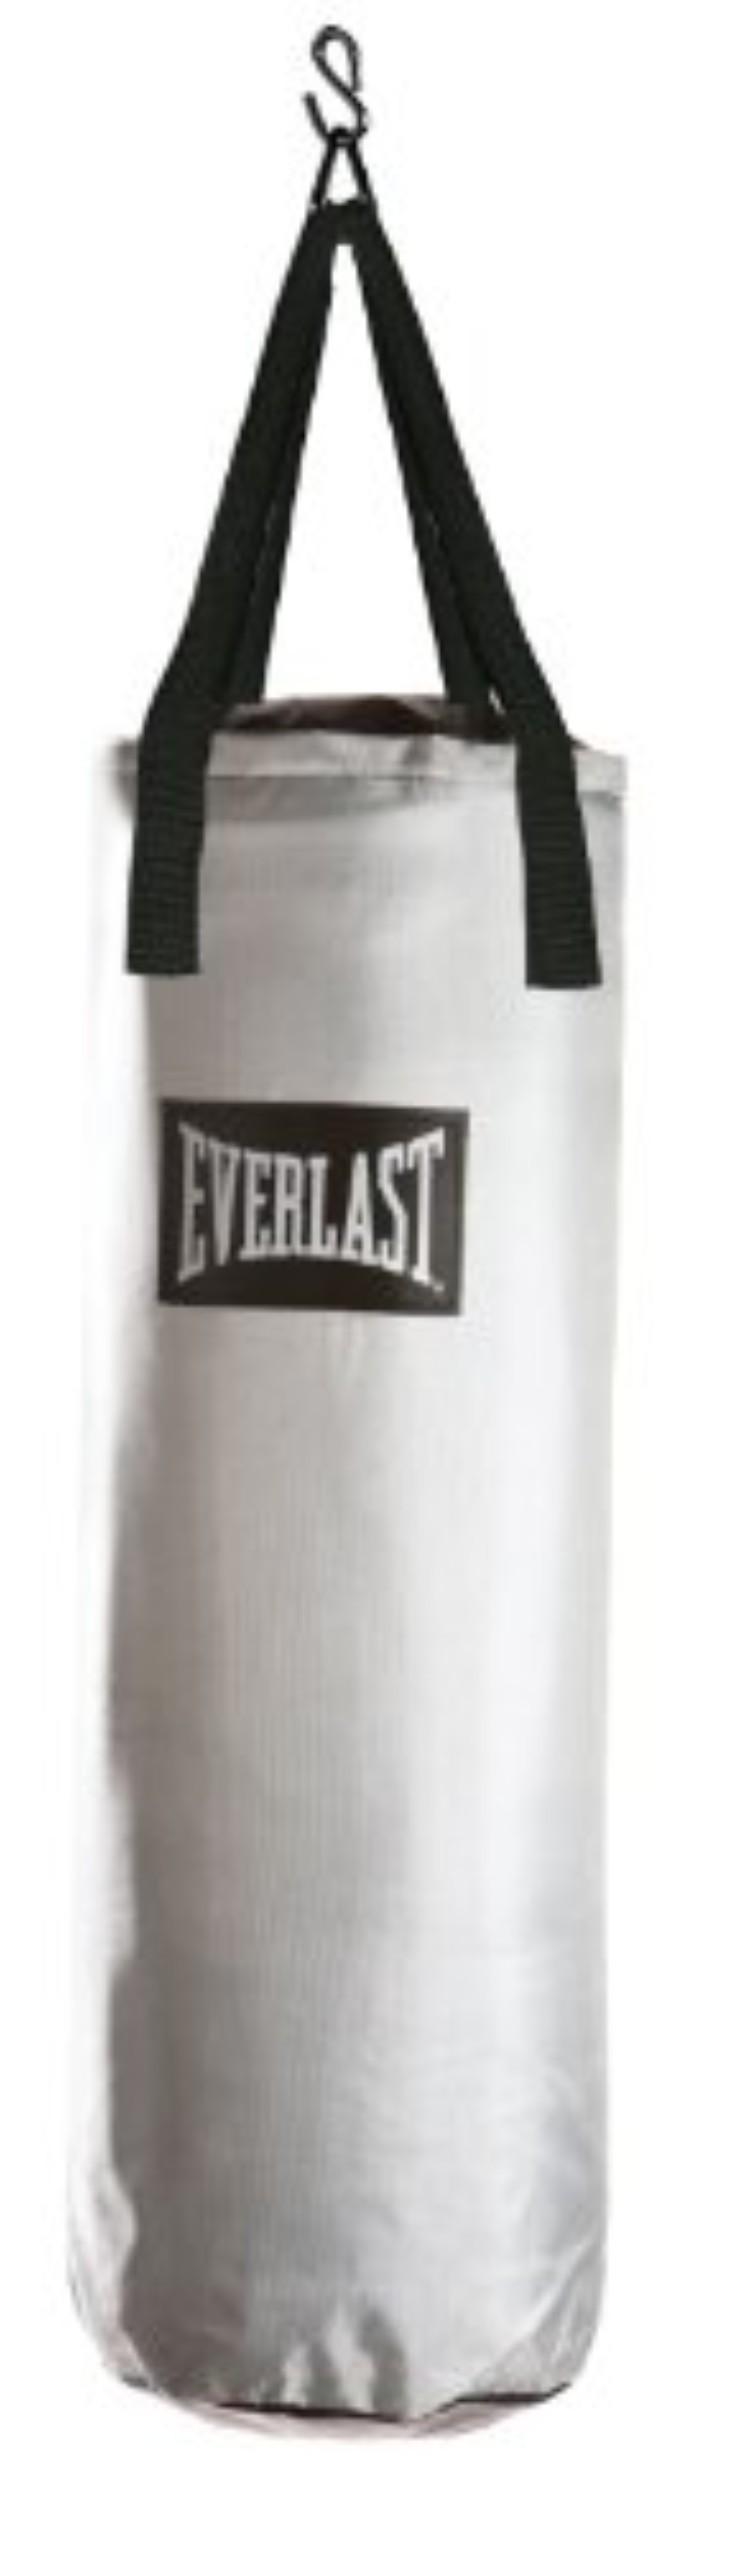 saco de boxeo everlast decathlon